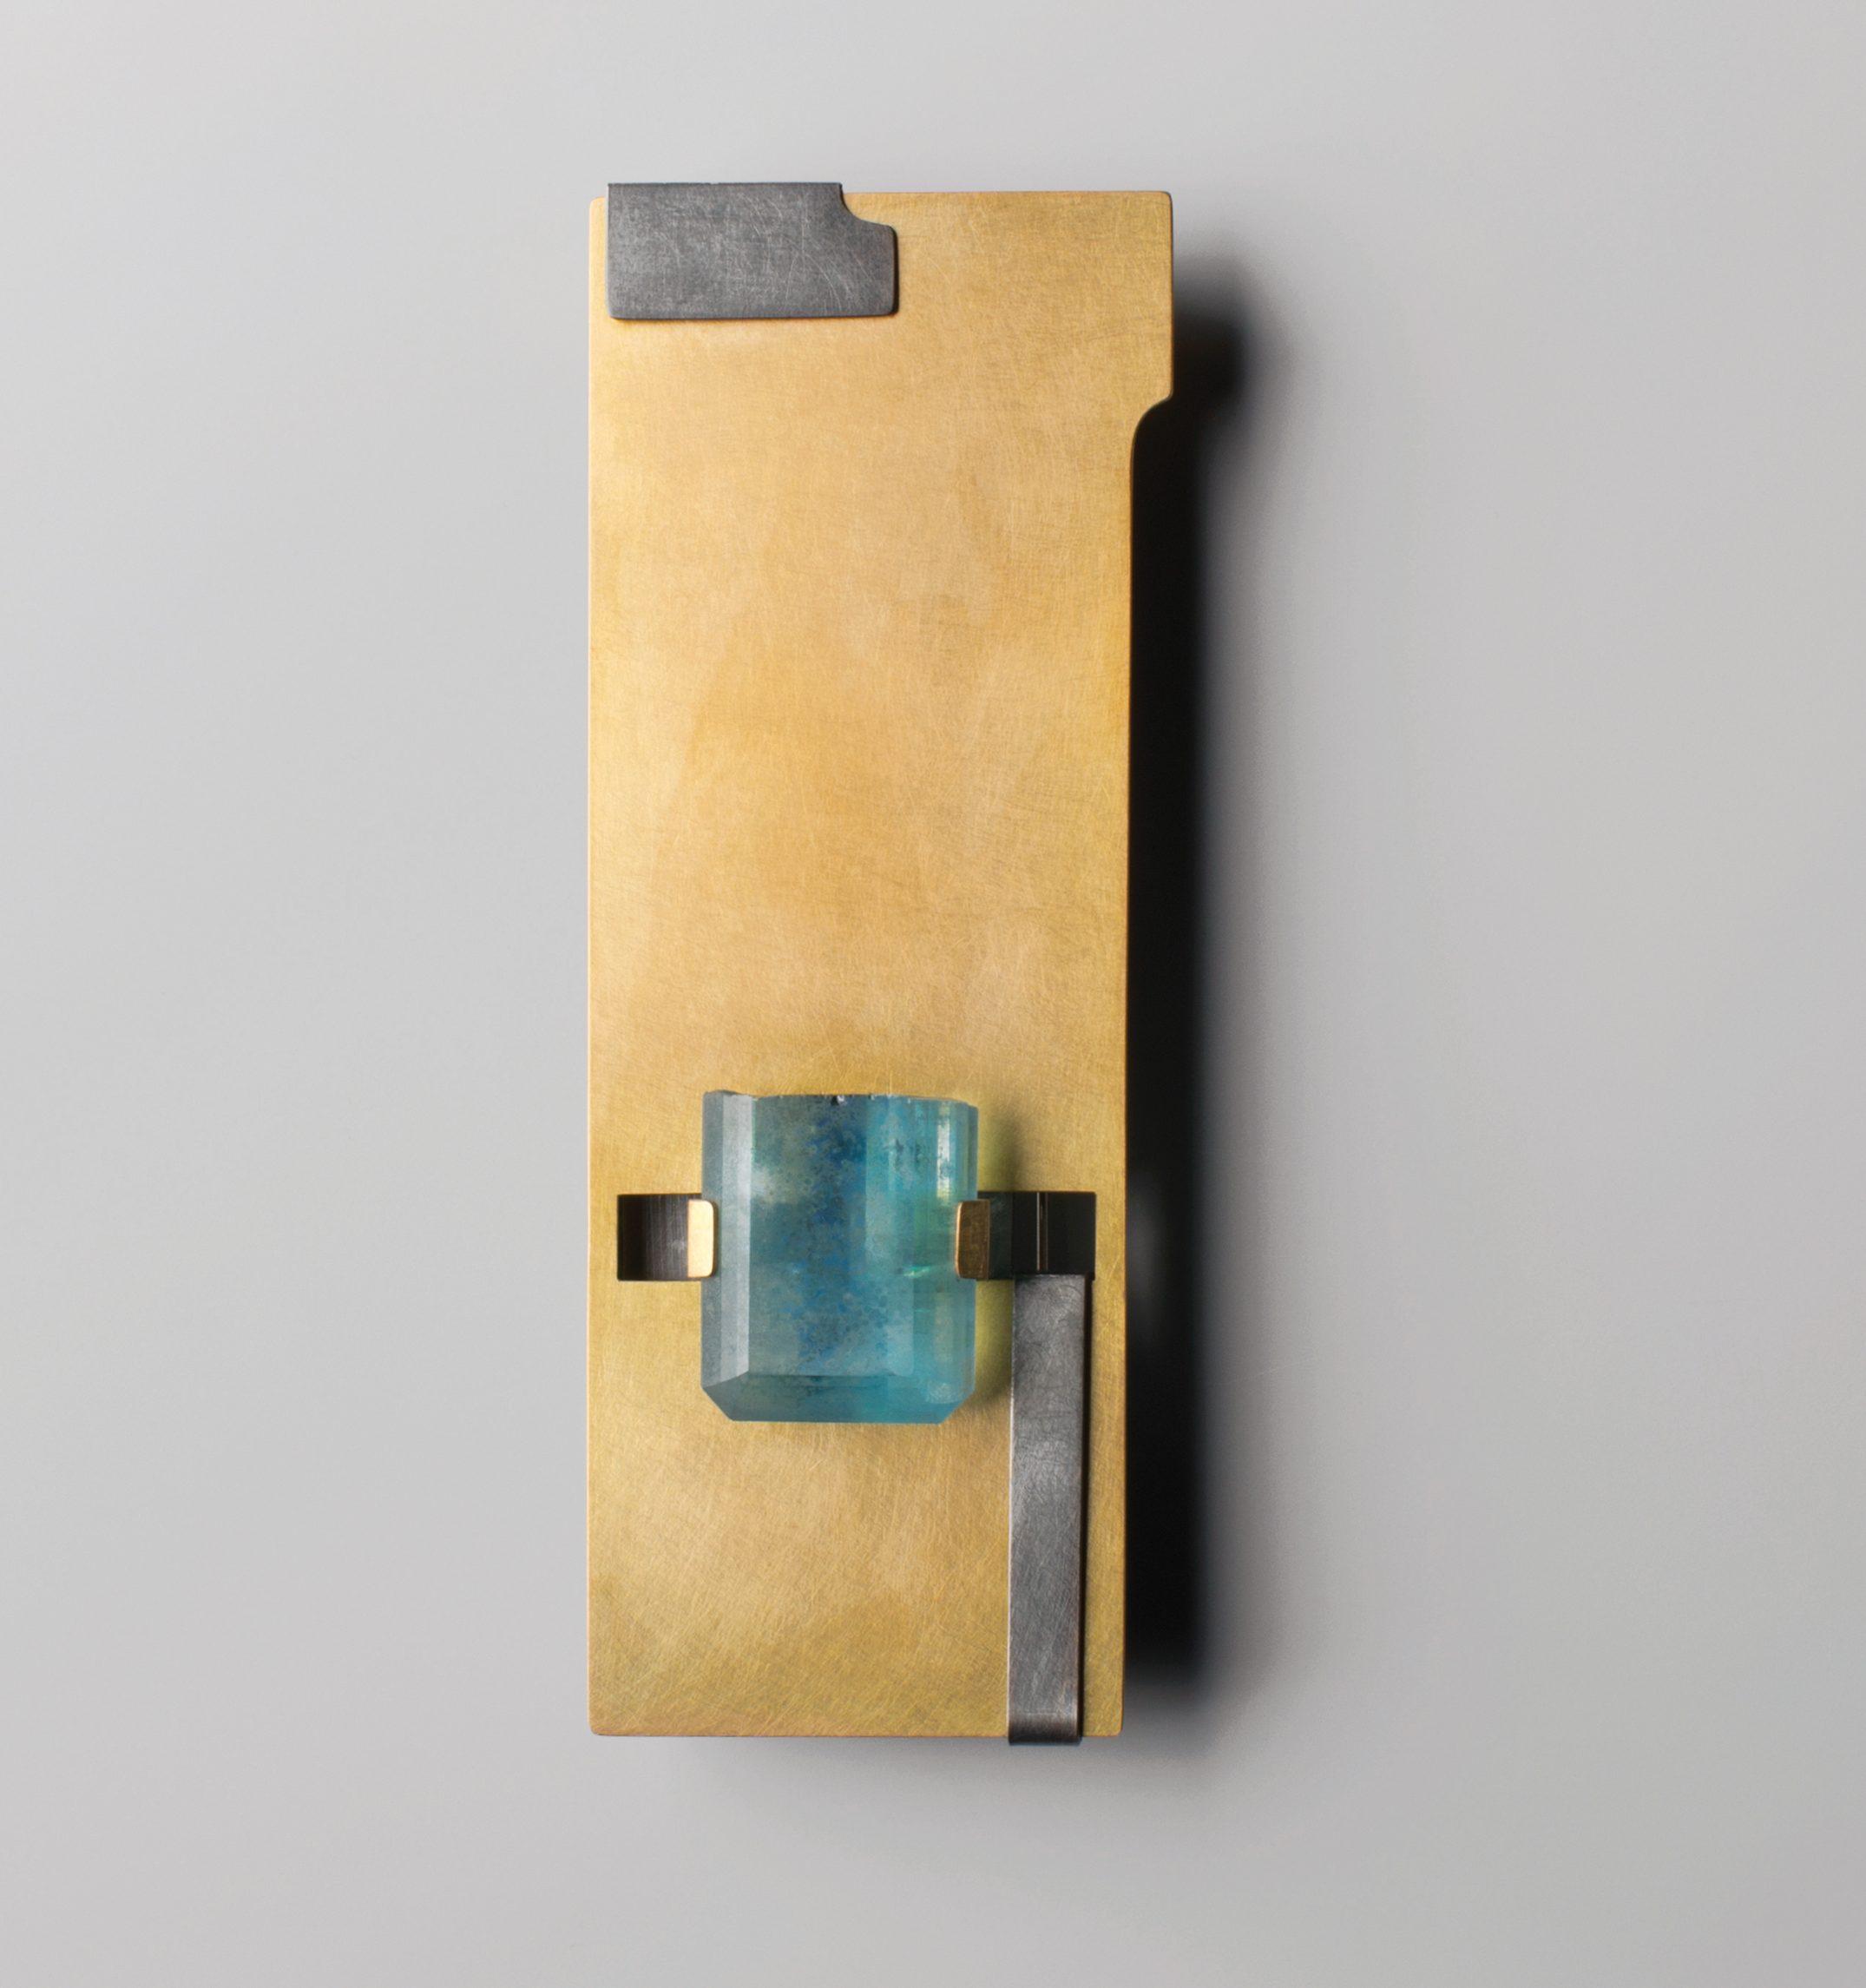 Ute Eitzenhöfer, broche, Unikate - Schmuck Pforzheimer Gestalter. Foto met dank aan Deutsches Goldschmiedehaus, David Fischer©